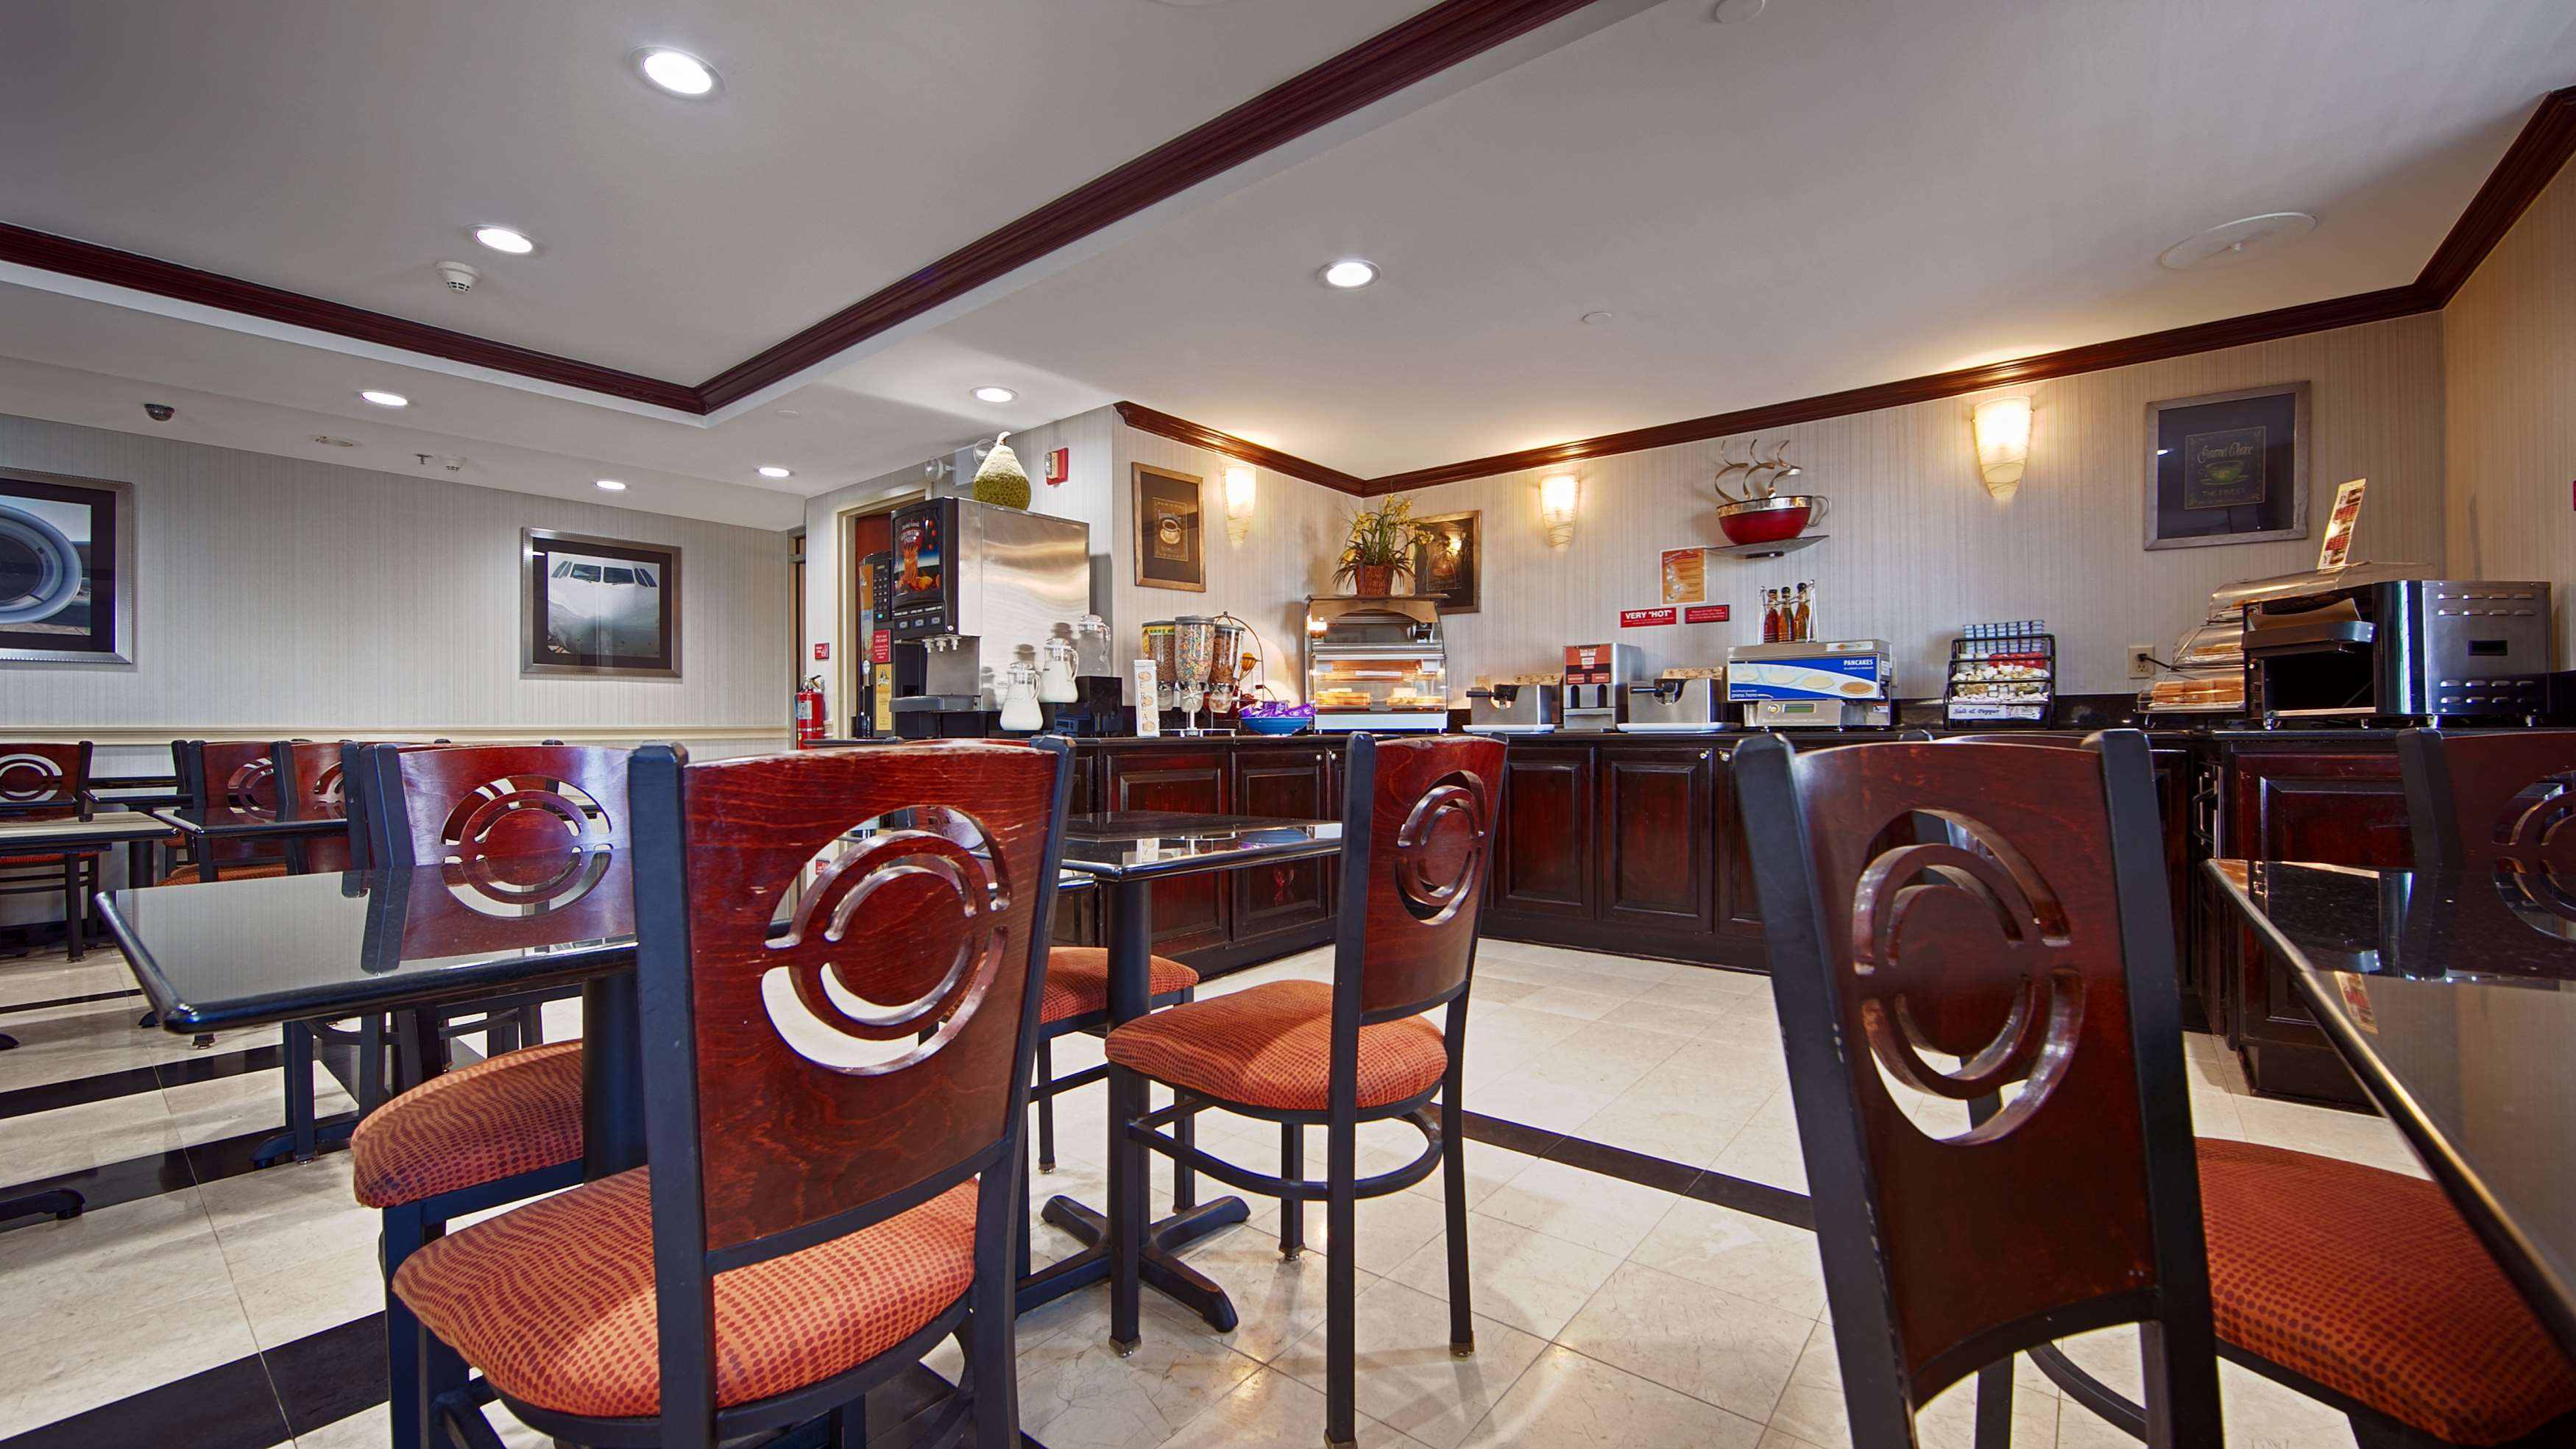 Best western jfk airport hotel in jamaica ny 11434 for Kew motor inn jamaica ny